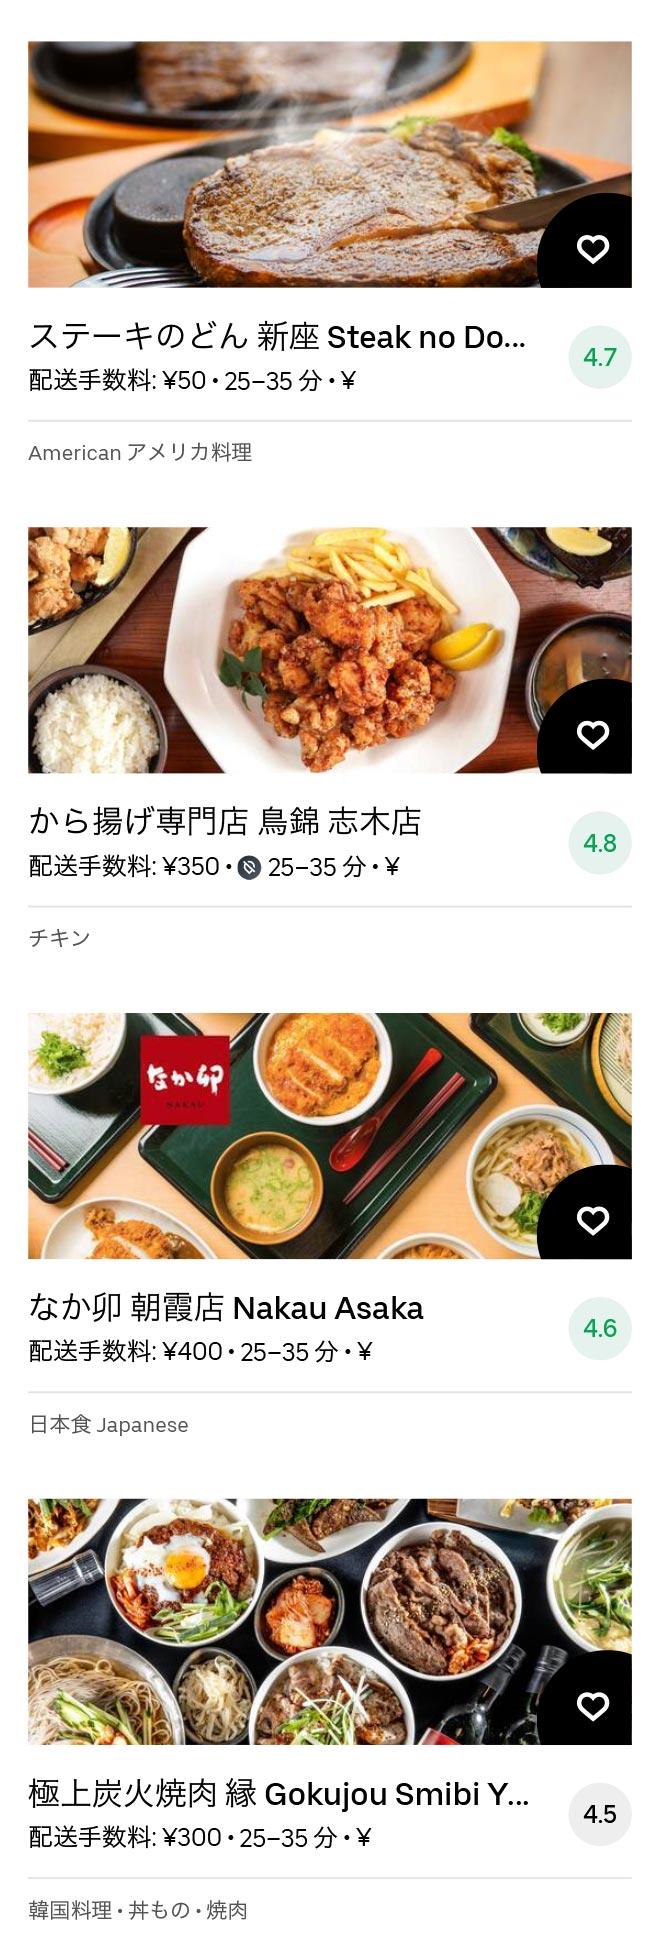 Niiza menu 2011 10